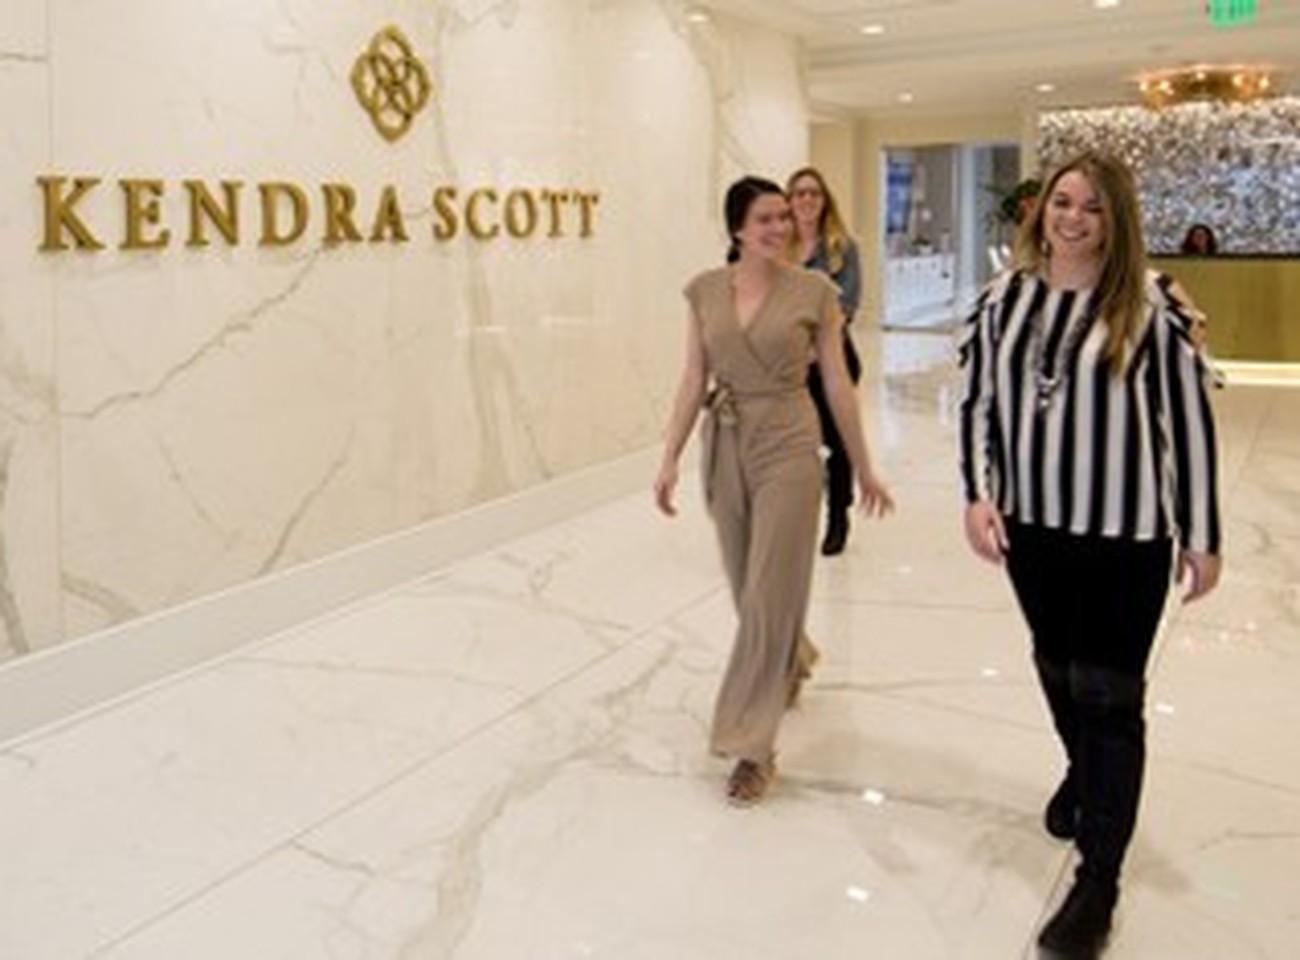 Kendra Scott Careers